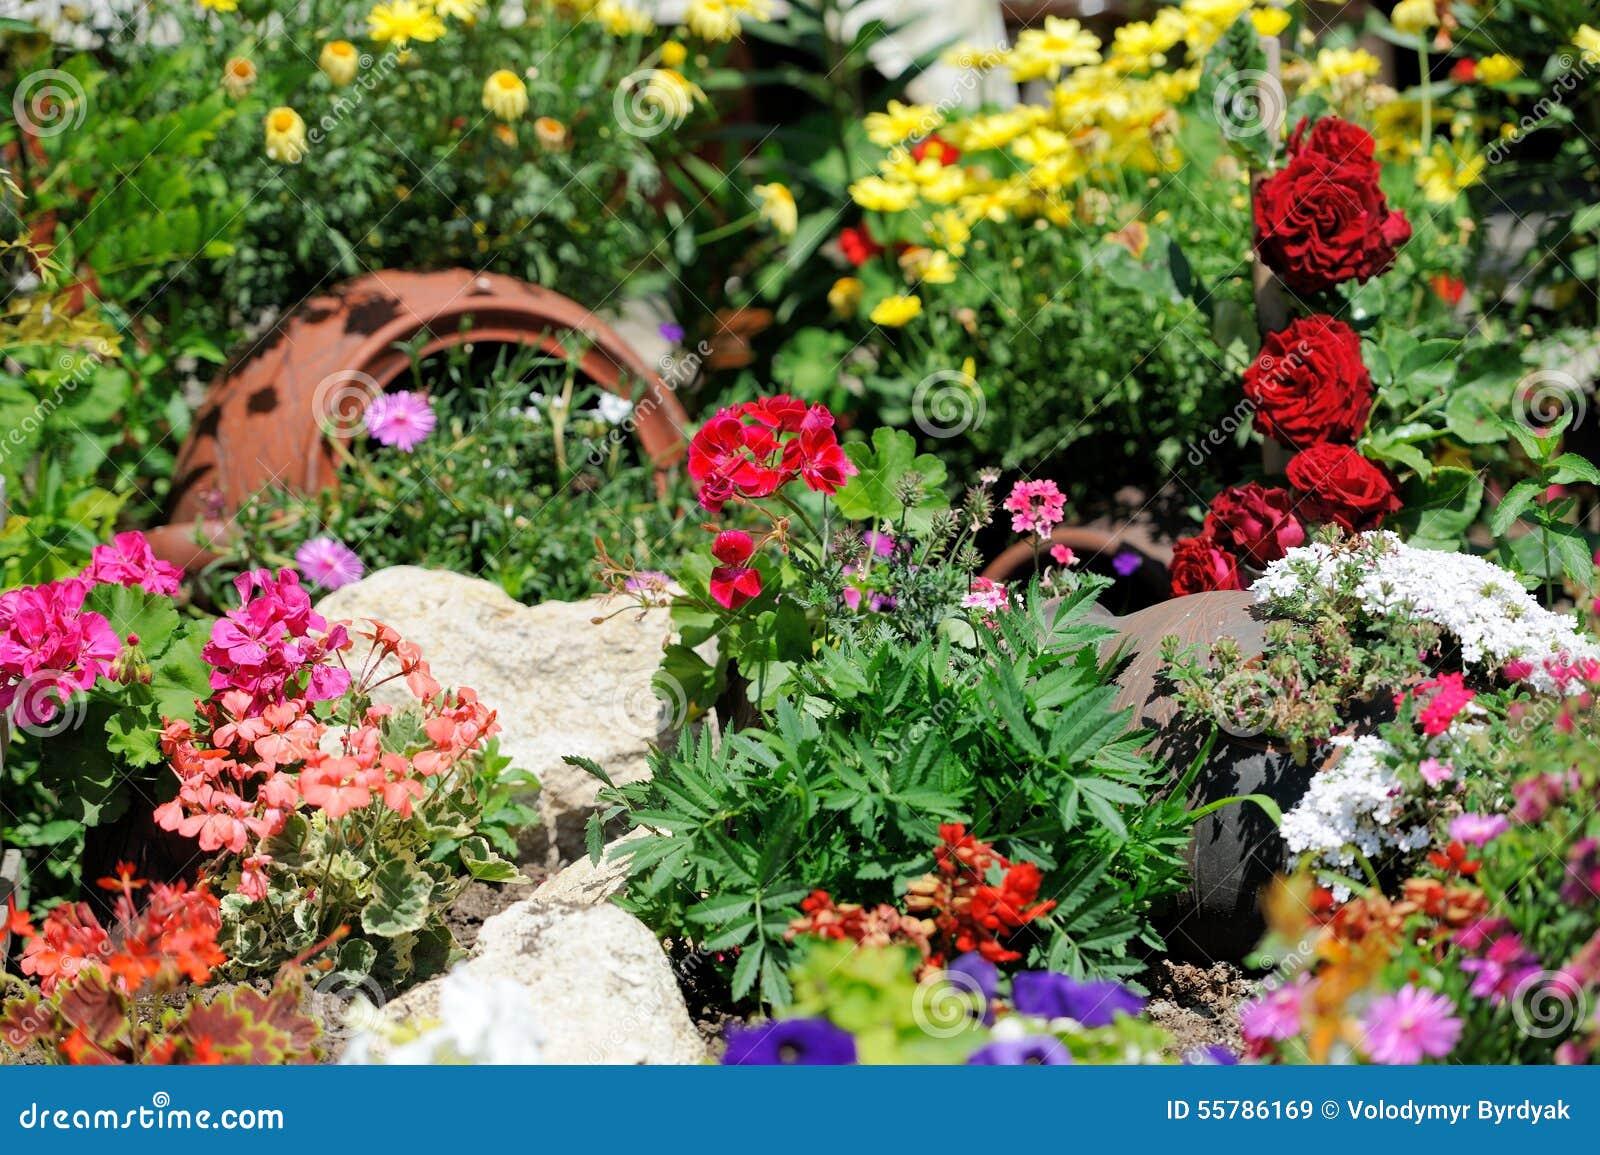 Flower Garden Background Stock Photo Image - Colorful flower garden background